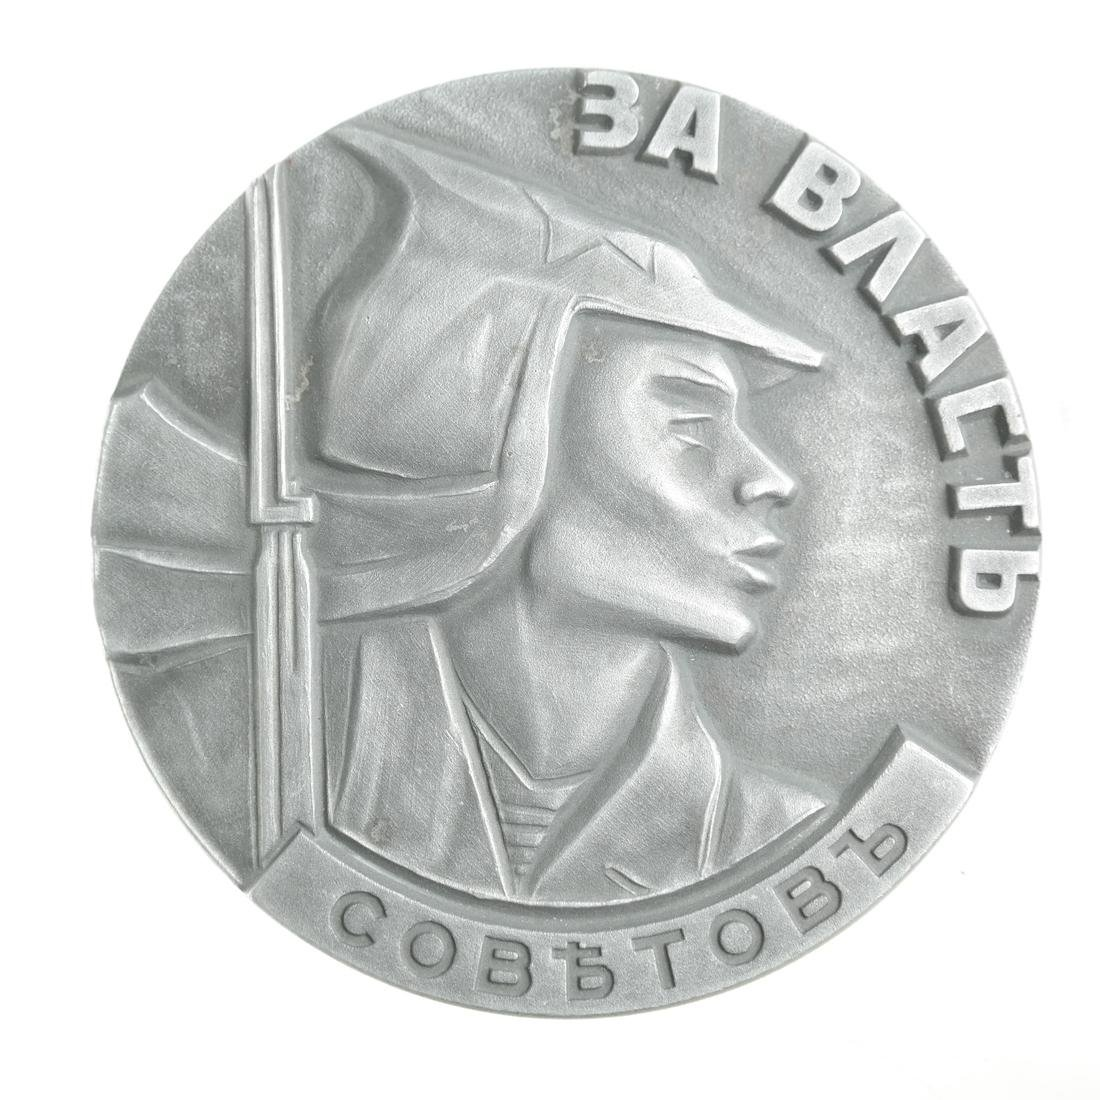 SOVIET UNION. TO SOVIET POWER! MEDALLION, 1967.